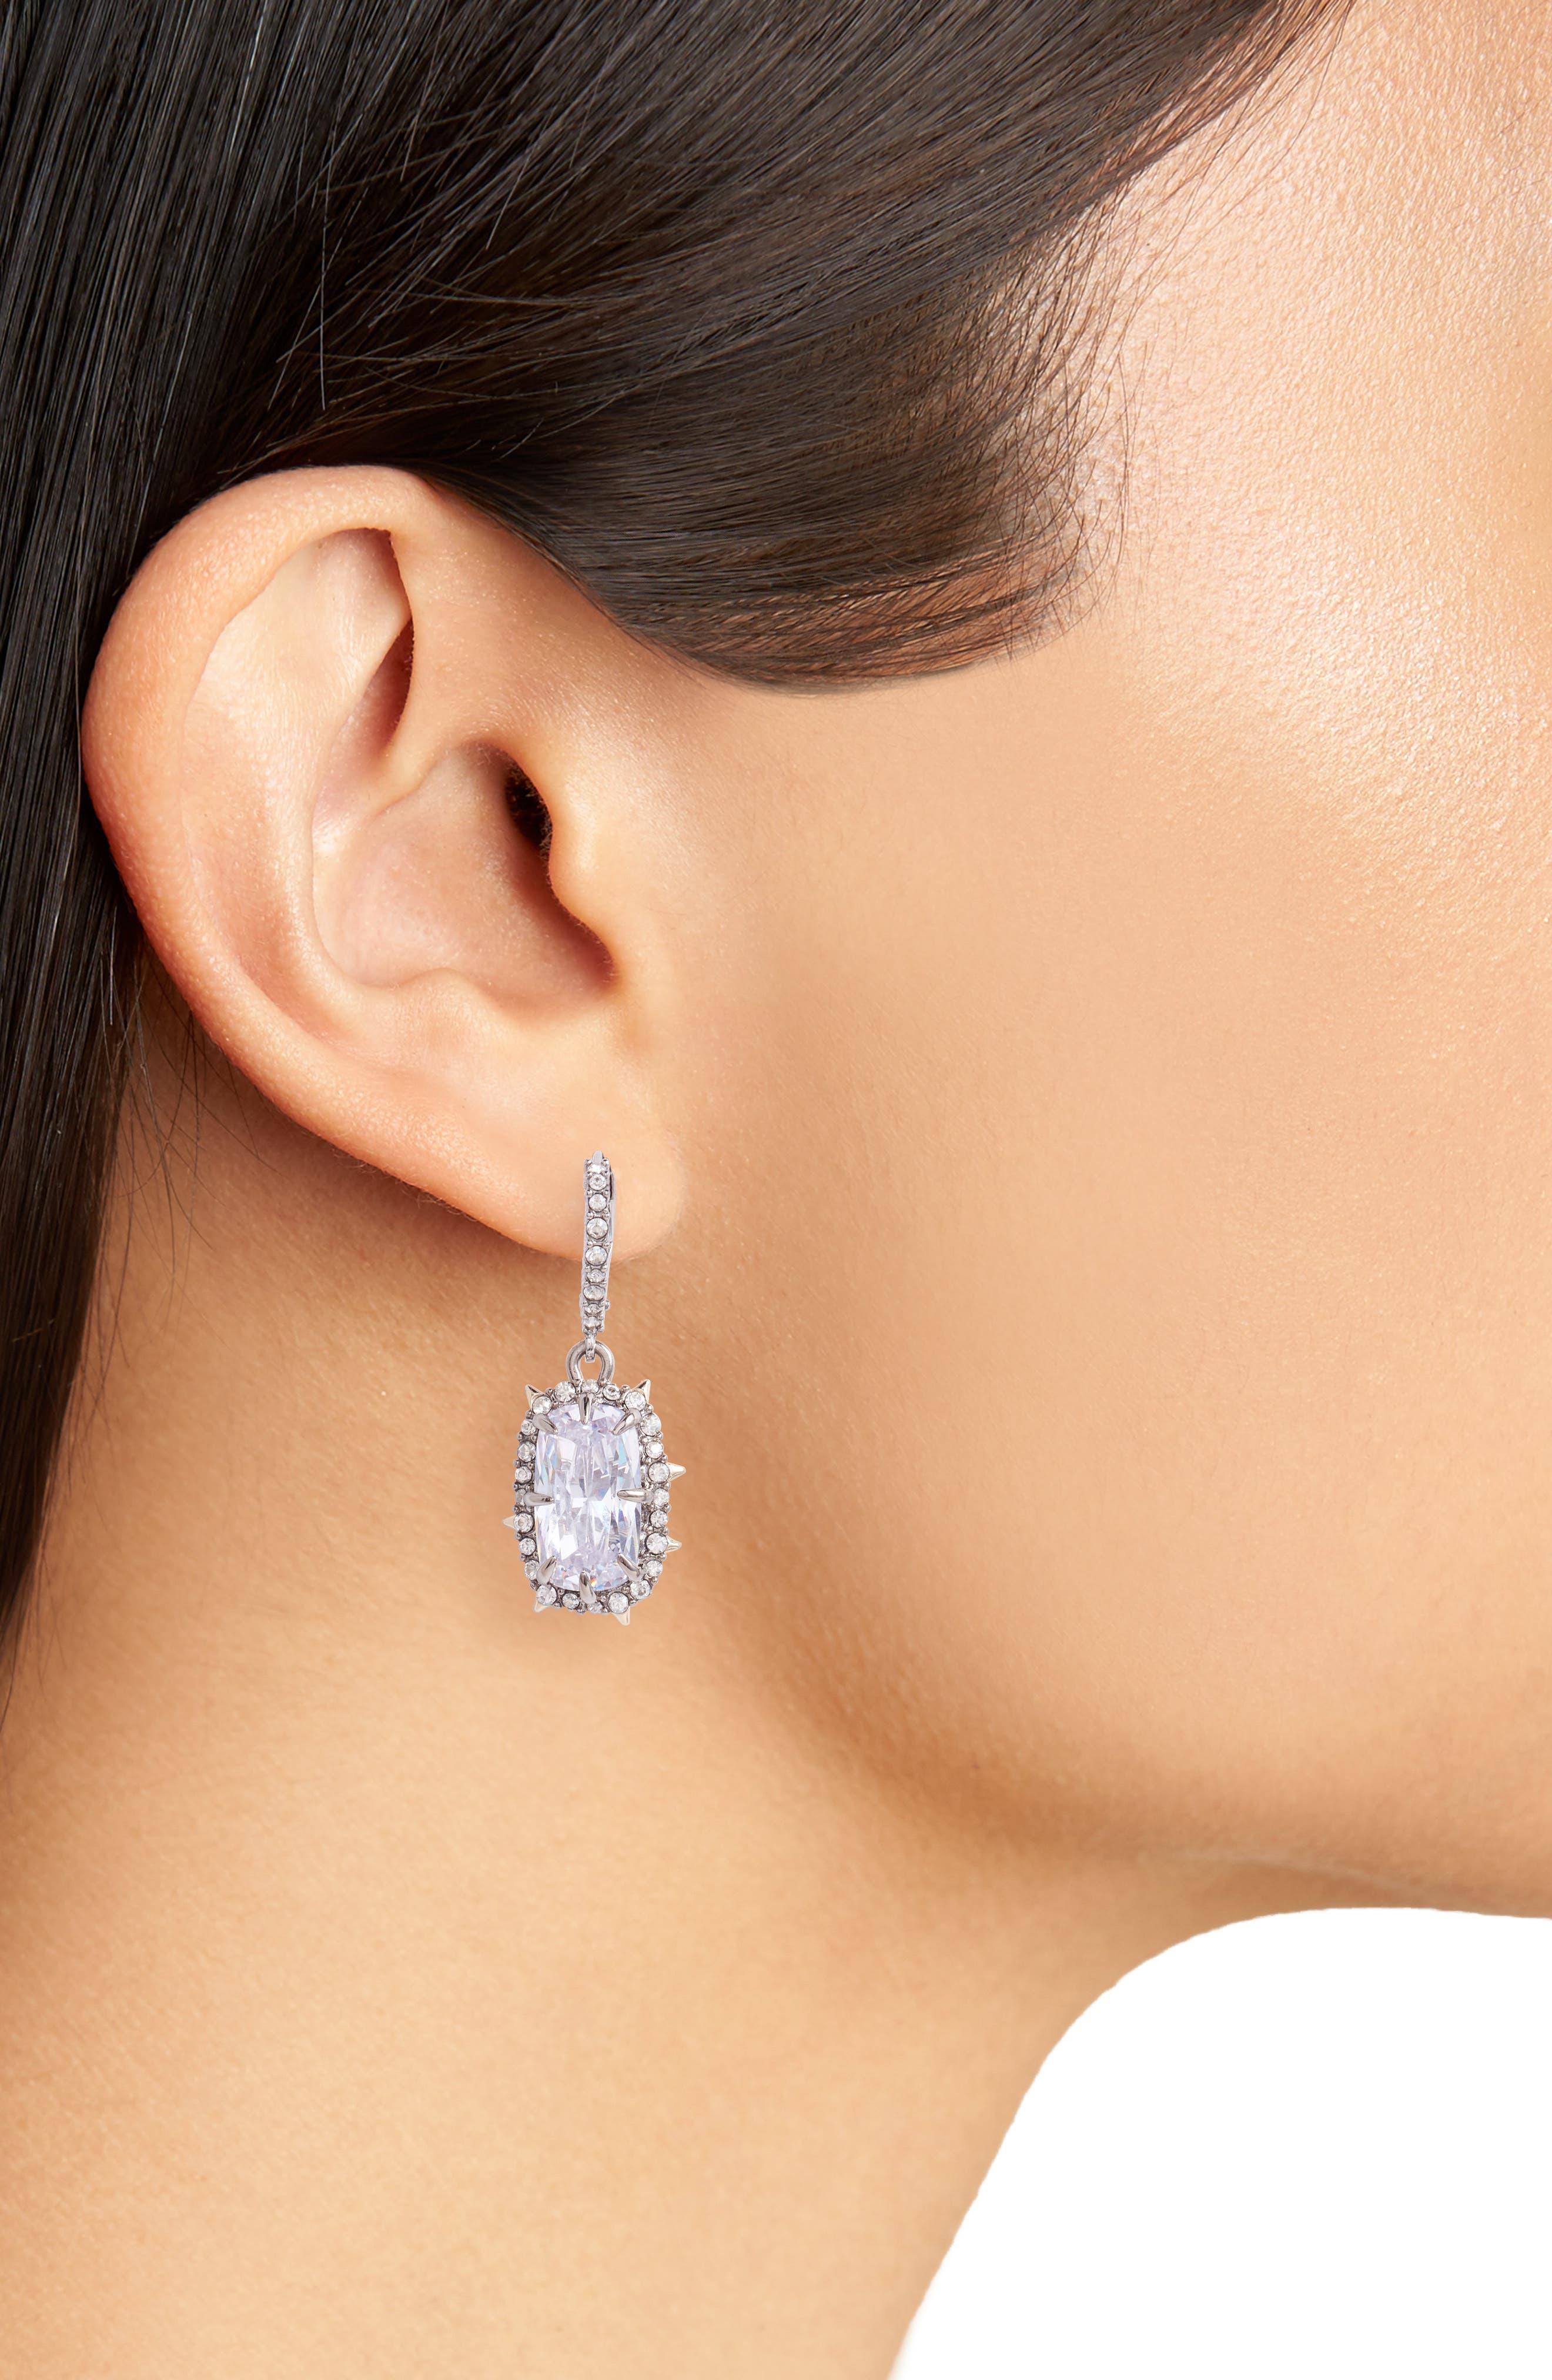 Swarovski Crystal Drop Earrings,                             Alternate thumbnail 2, color,                             GOLD